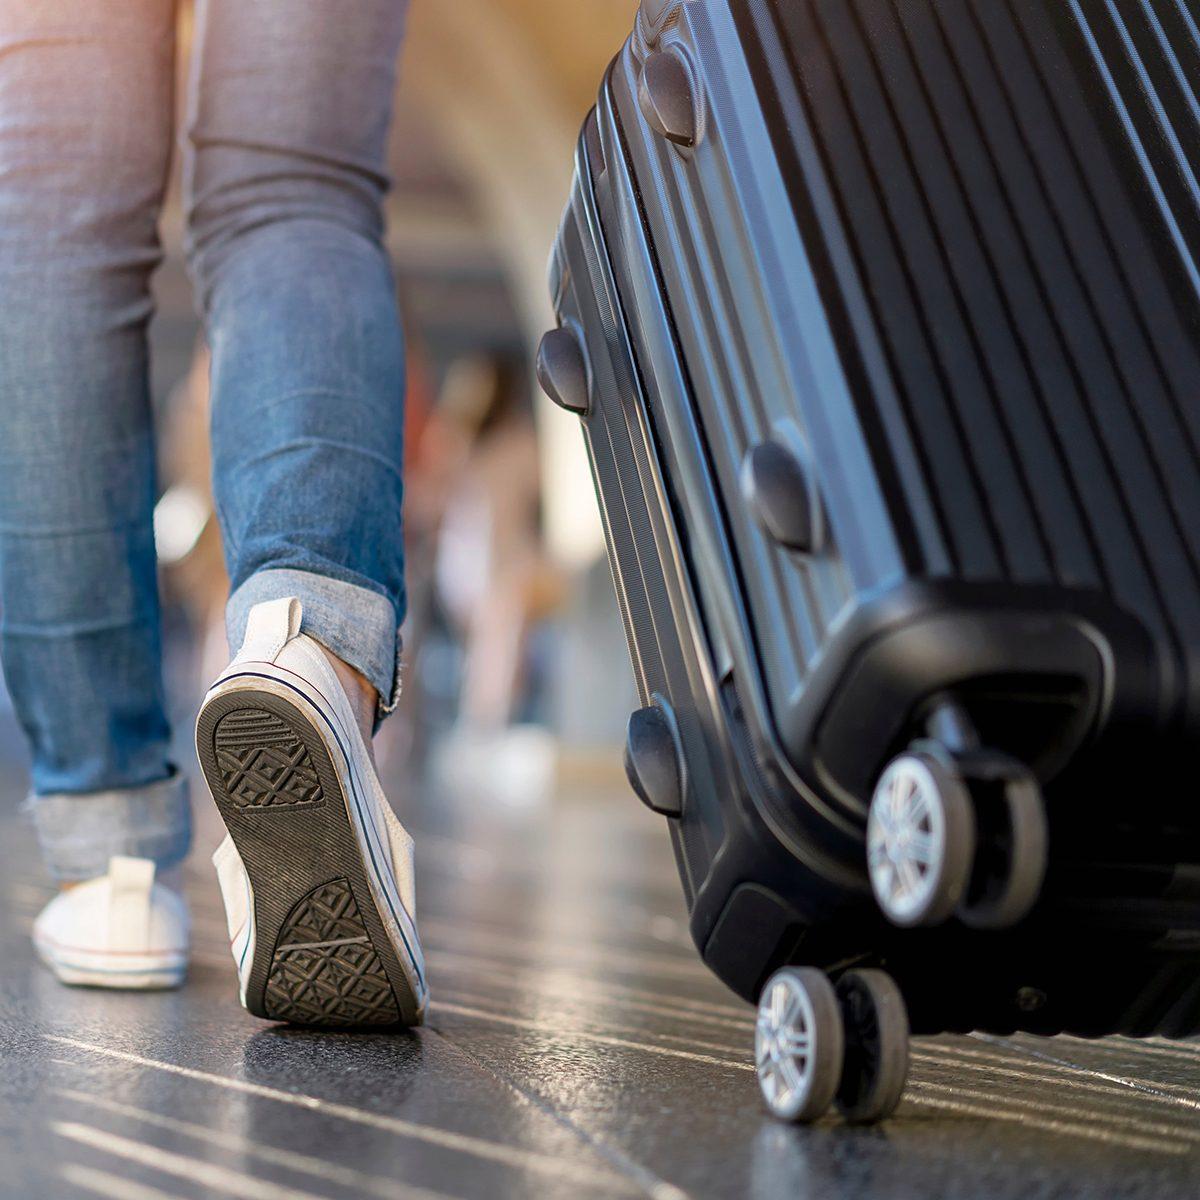 Person wheeling luggage through airport